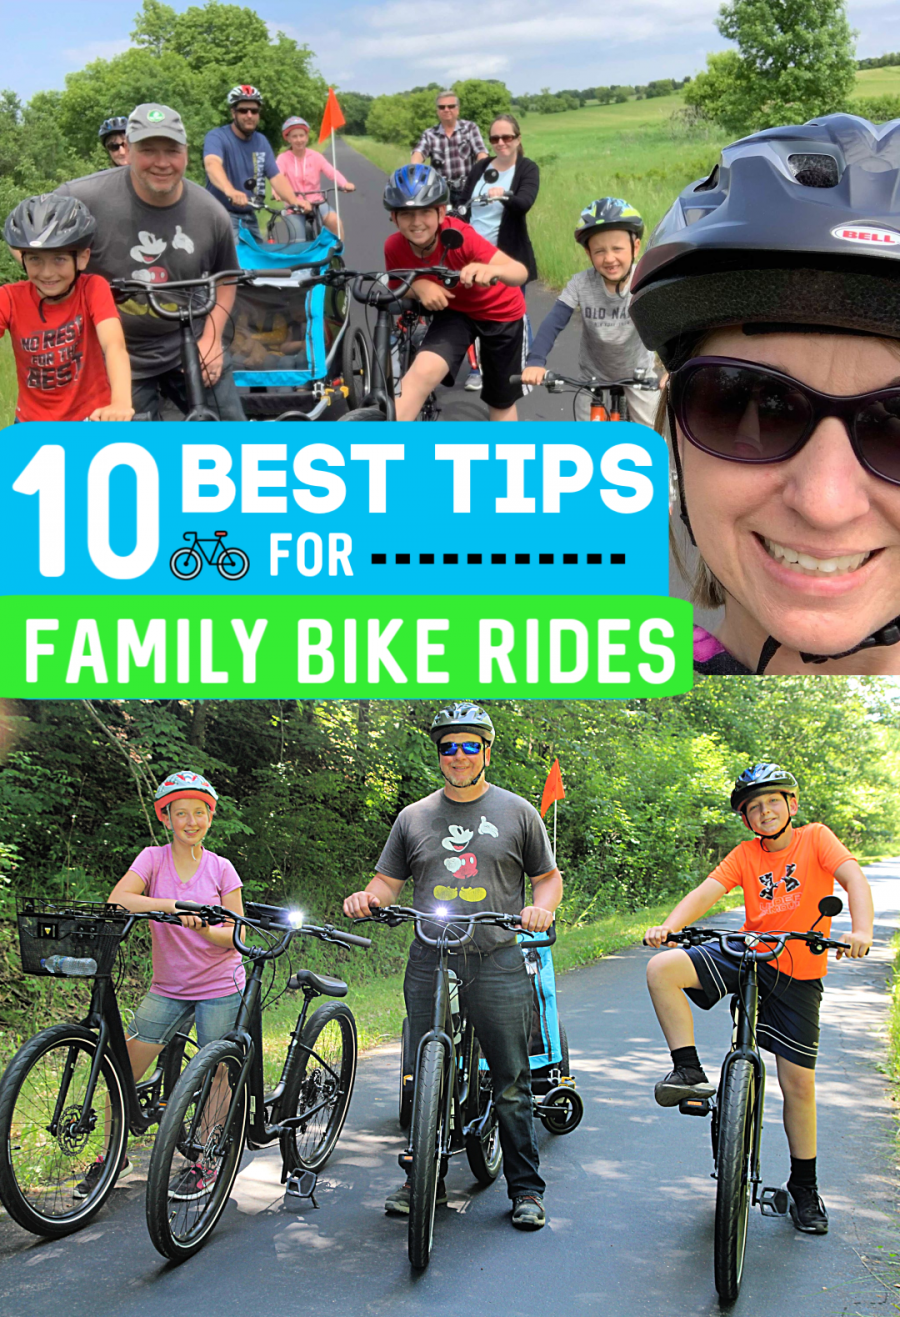 Pin By Holli On Biking In 2020 Family Bike Bike Ride Kids Bike